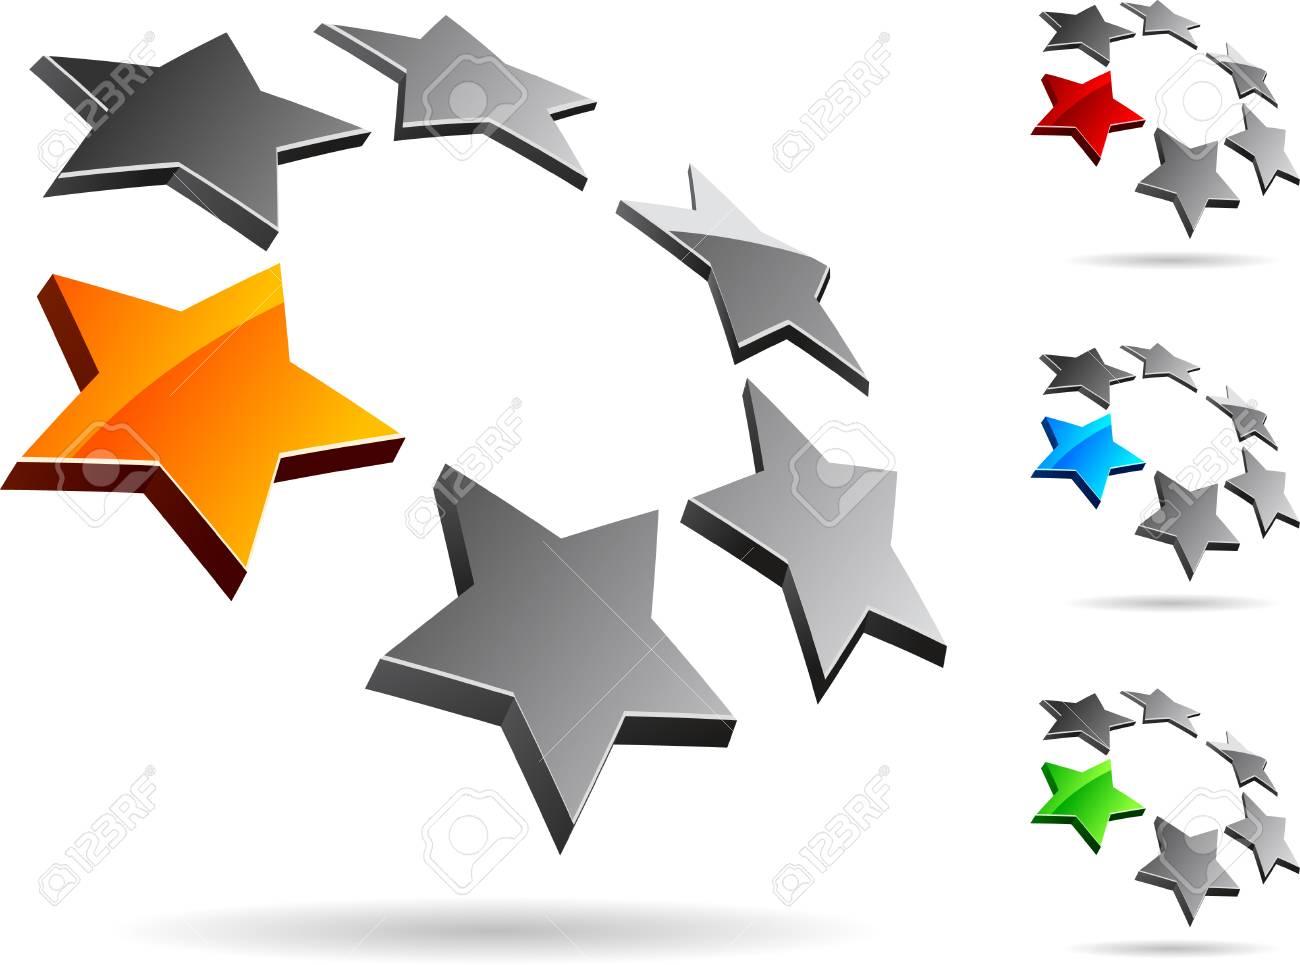 Abstract company symbol. Vector illustration. Stock Vector - 5212957